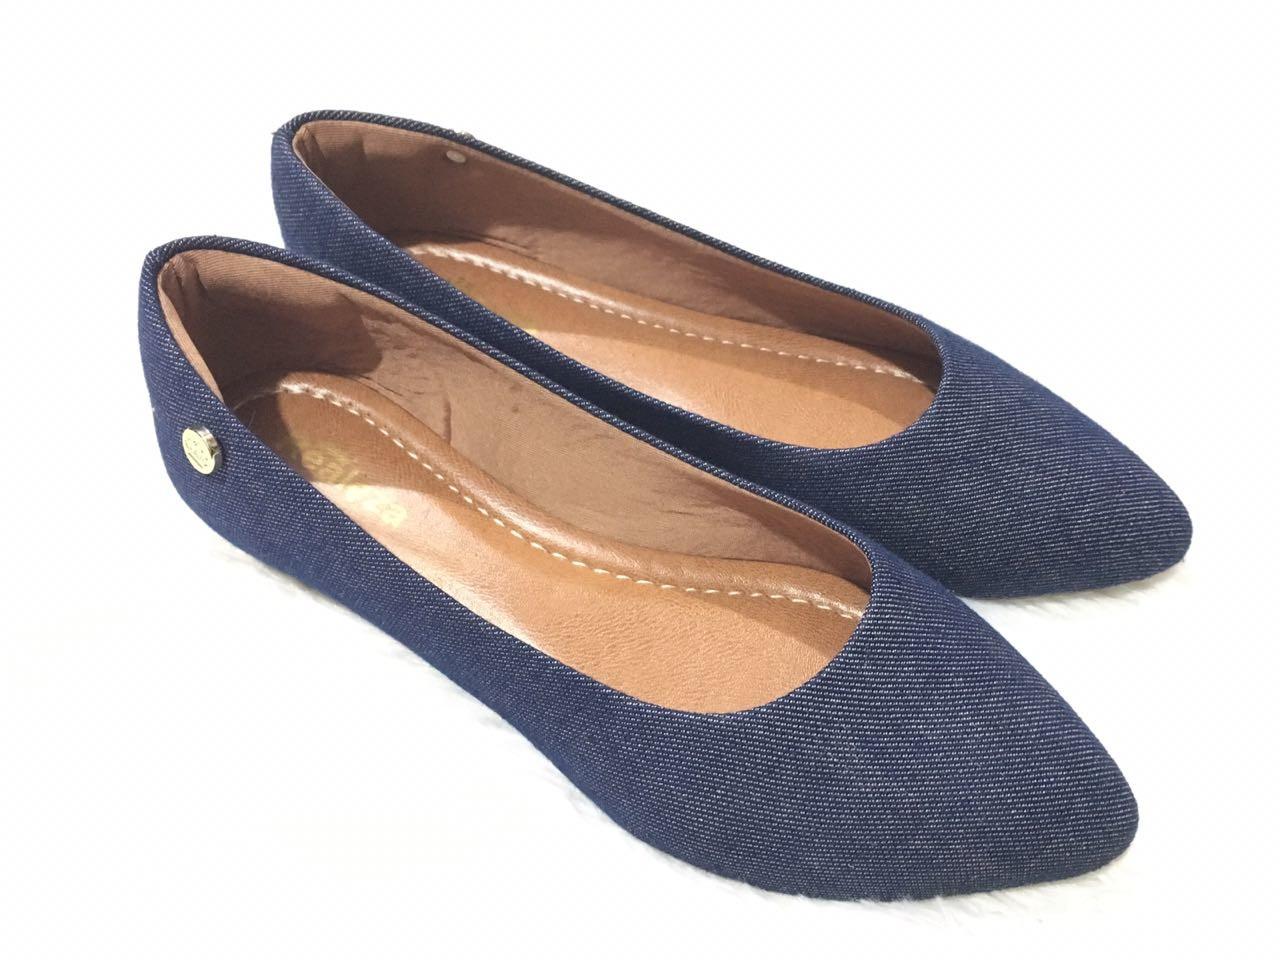 371930d60 Sapatilha Feminina Jeans | Elo7